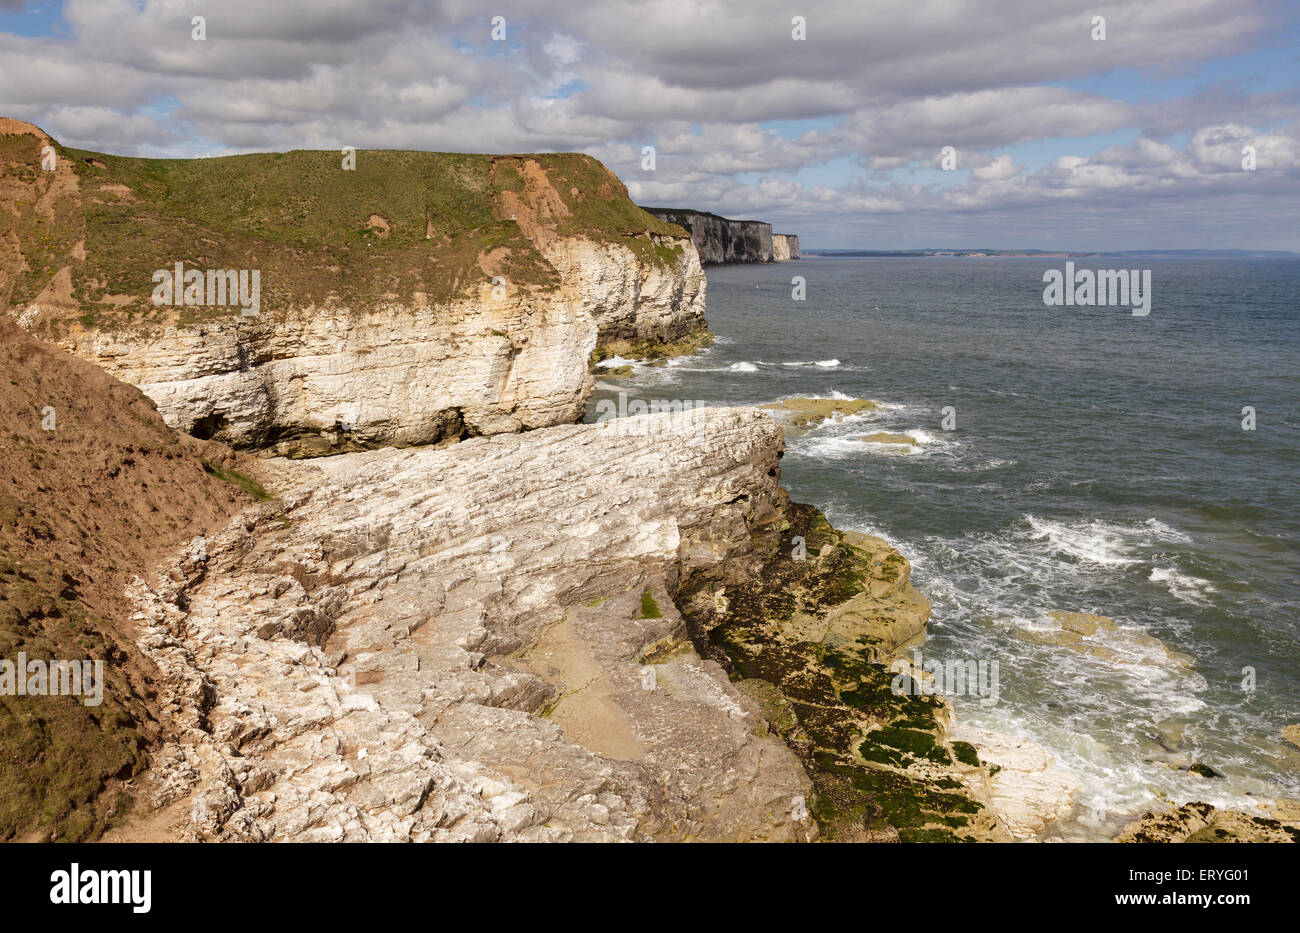 Coastline viewed from Thornwick Bay, Flamborough, Bridlington, Yorkshire, England Stock Photo